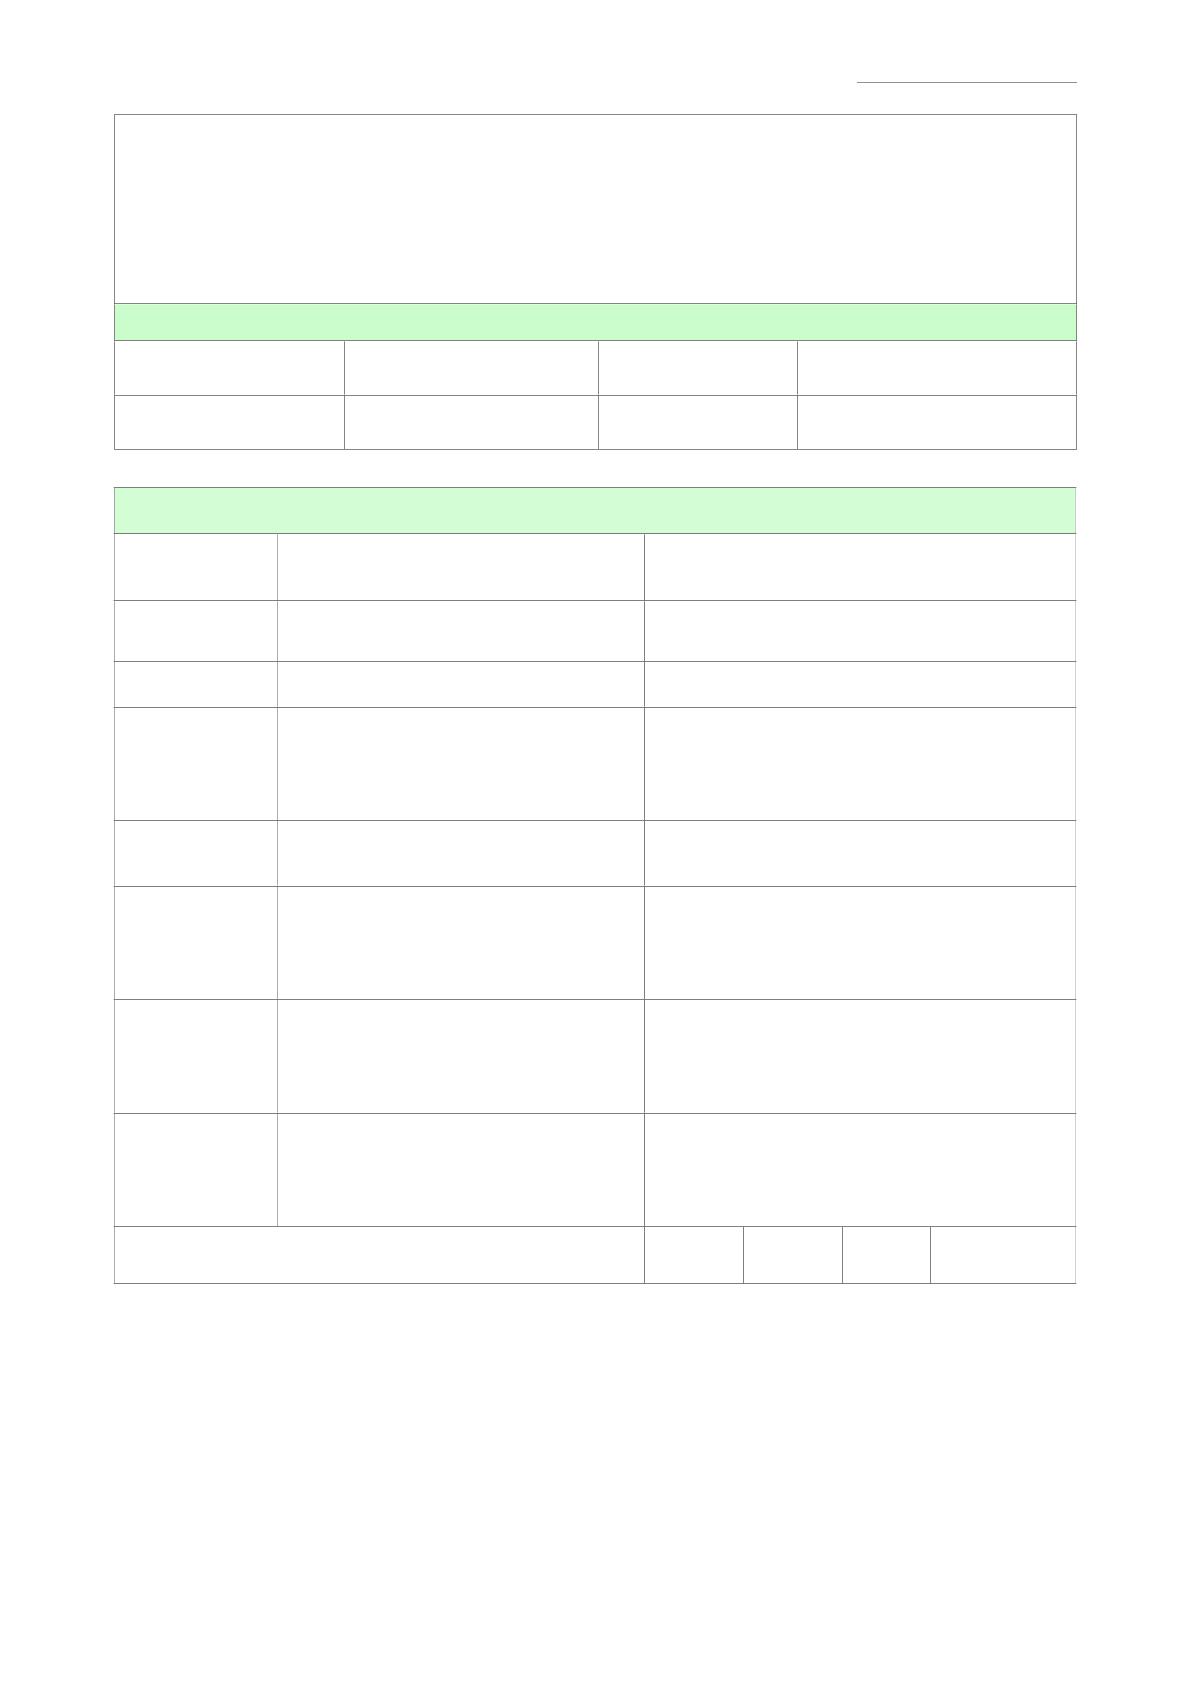 Shoot Schedule Template Yelomphonecompany